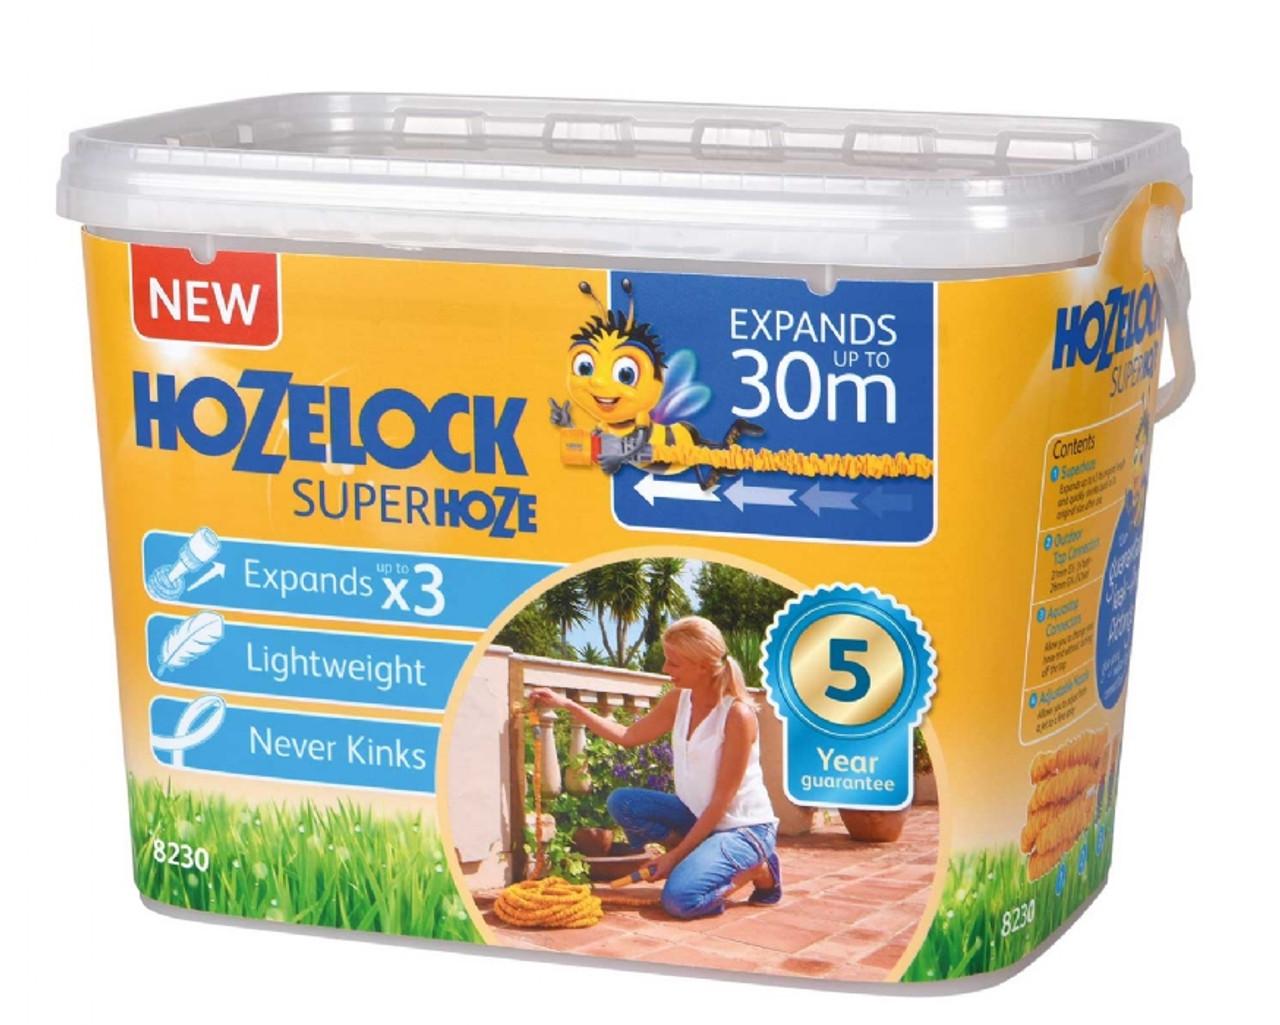 Hozelock 8230 8000 Superhoze 30mtr